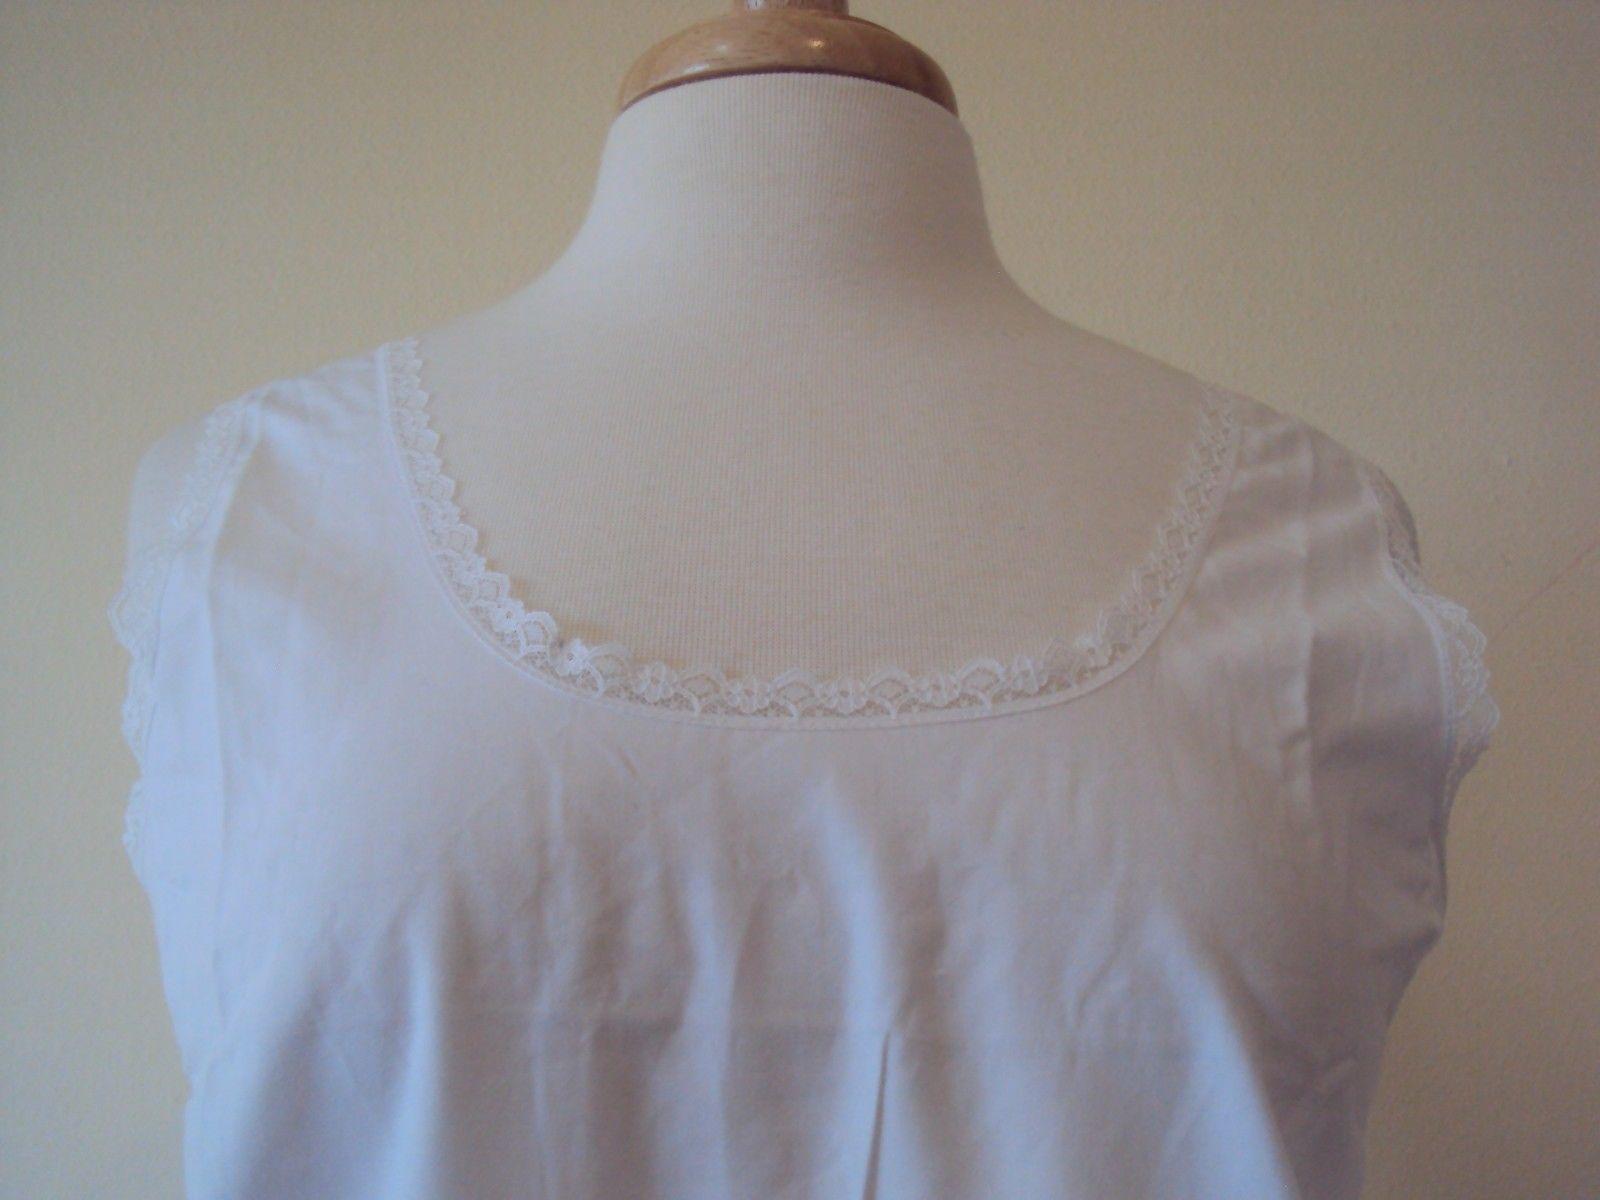 Velrose Lingerie Cool Cotton Cotton Full Slips White Style 801 size 36-54 image 2